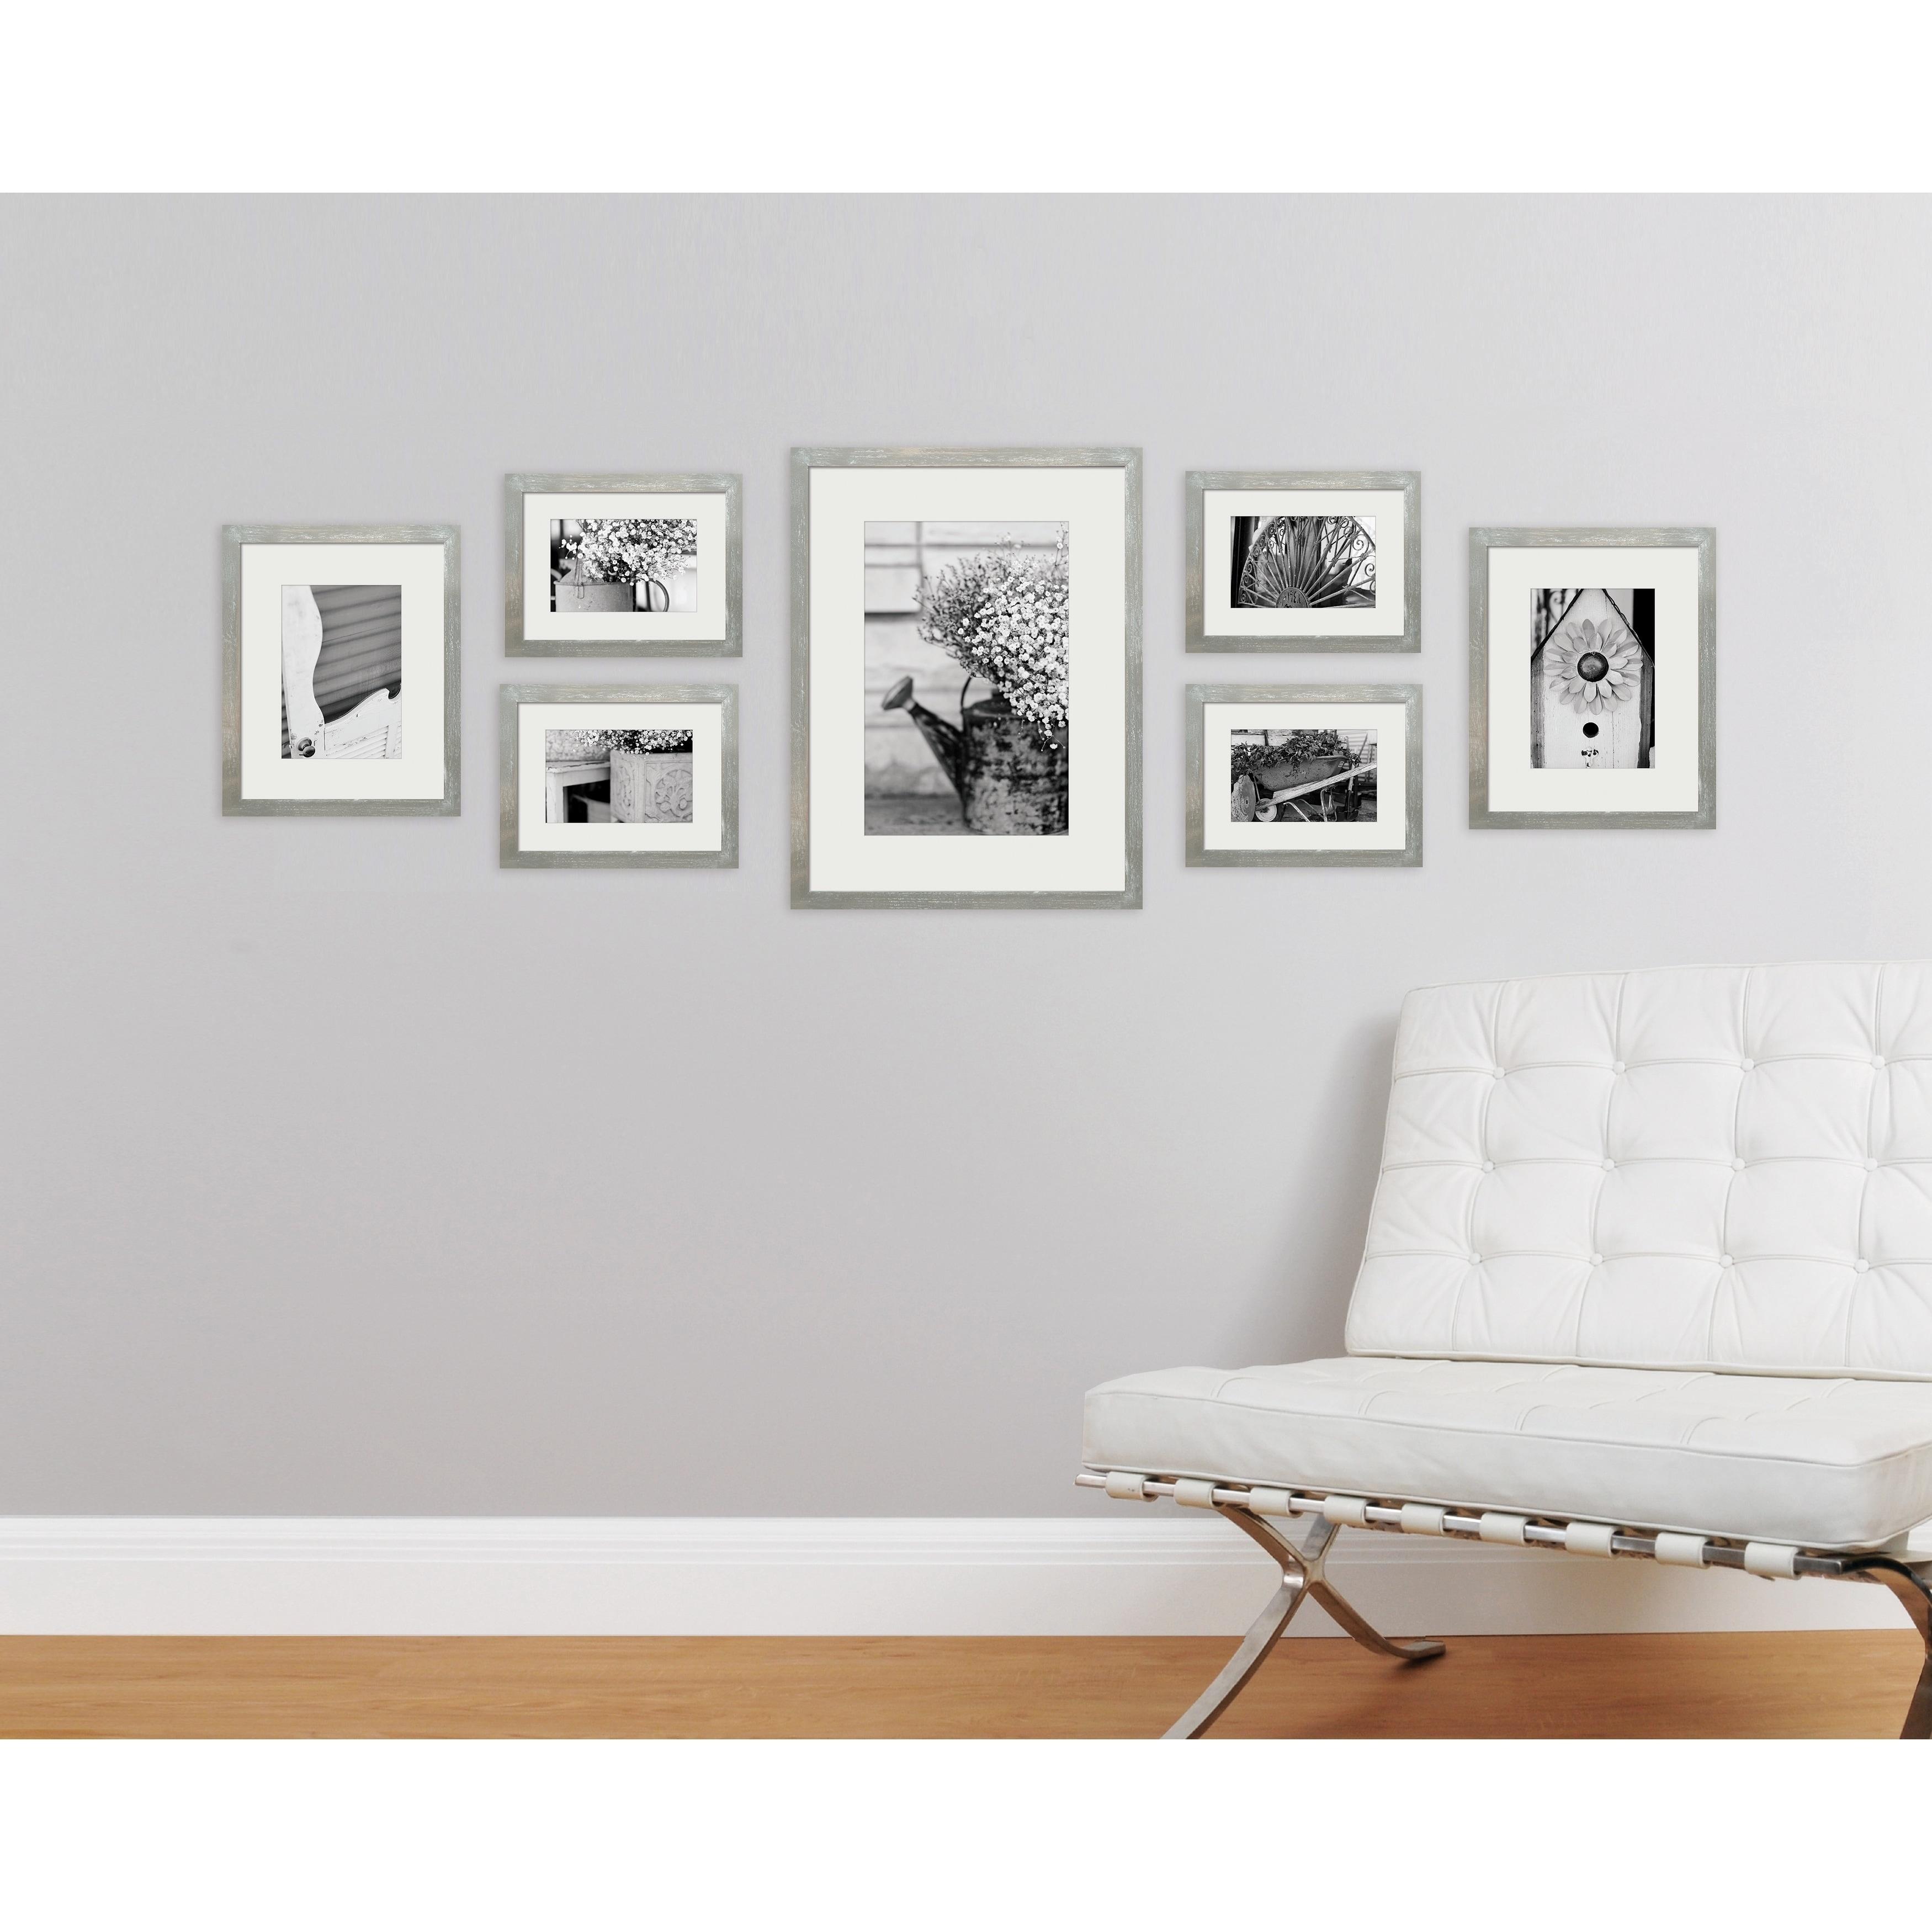 Shop 7 Piece Greywash Photo Frame Wall Gallery Kit with Decorative ...